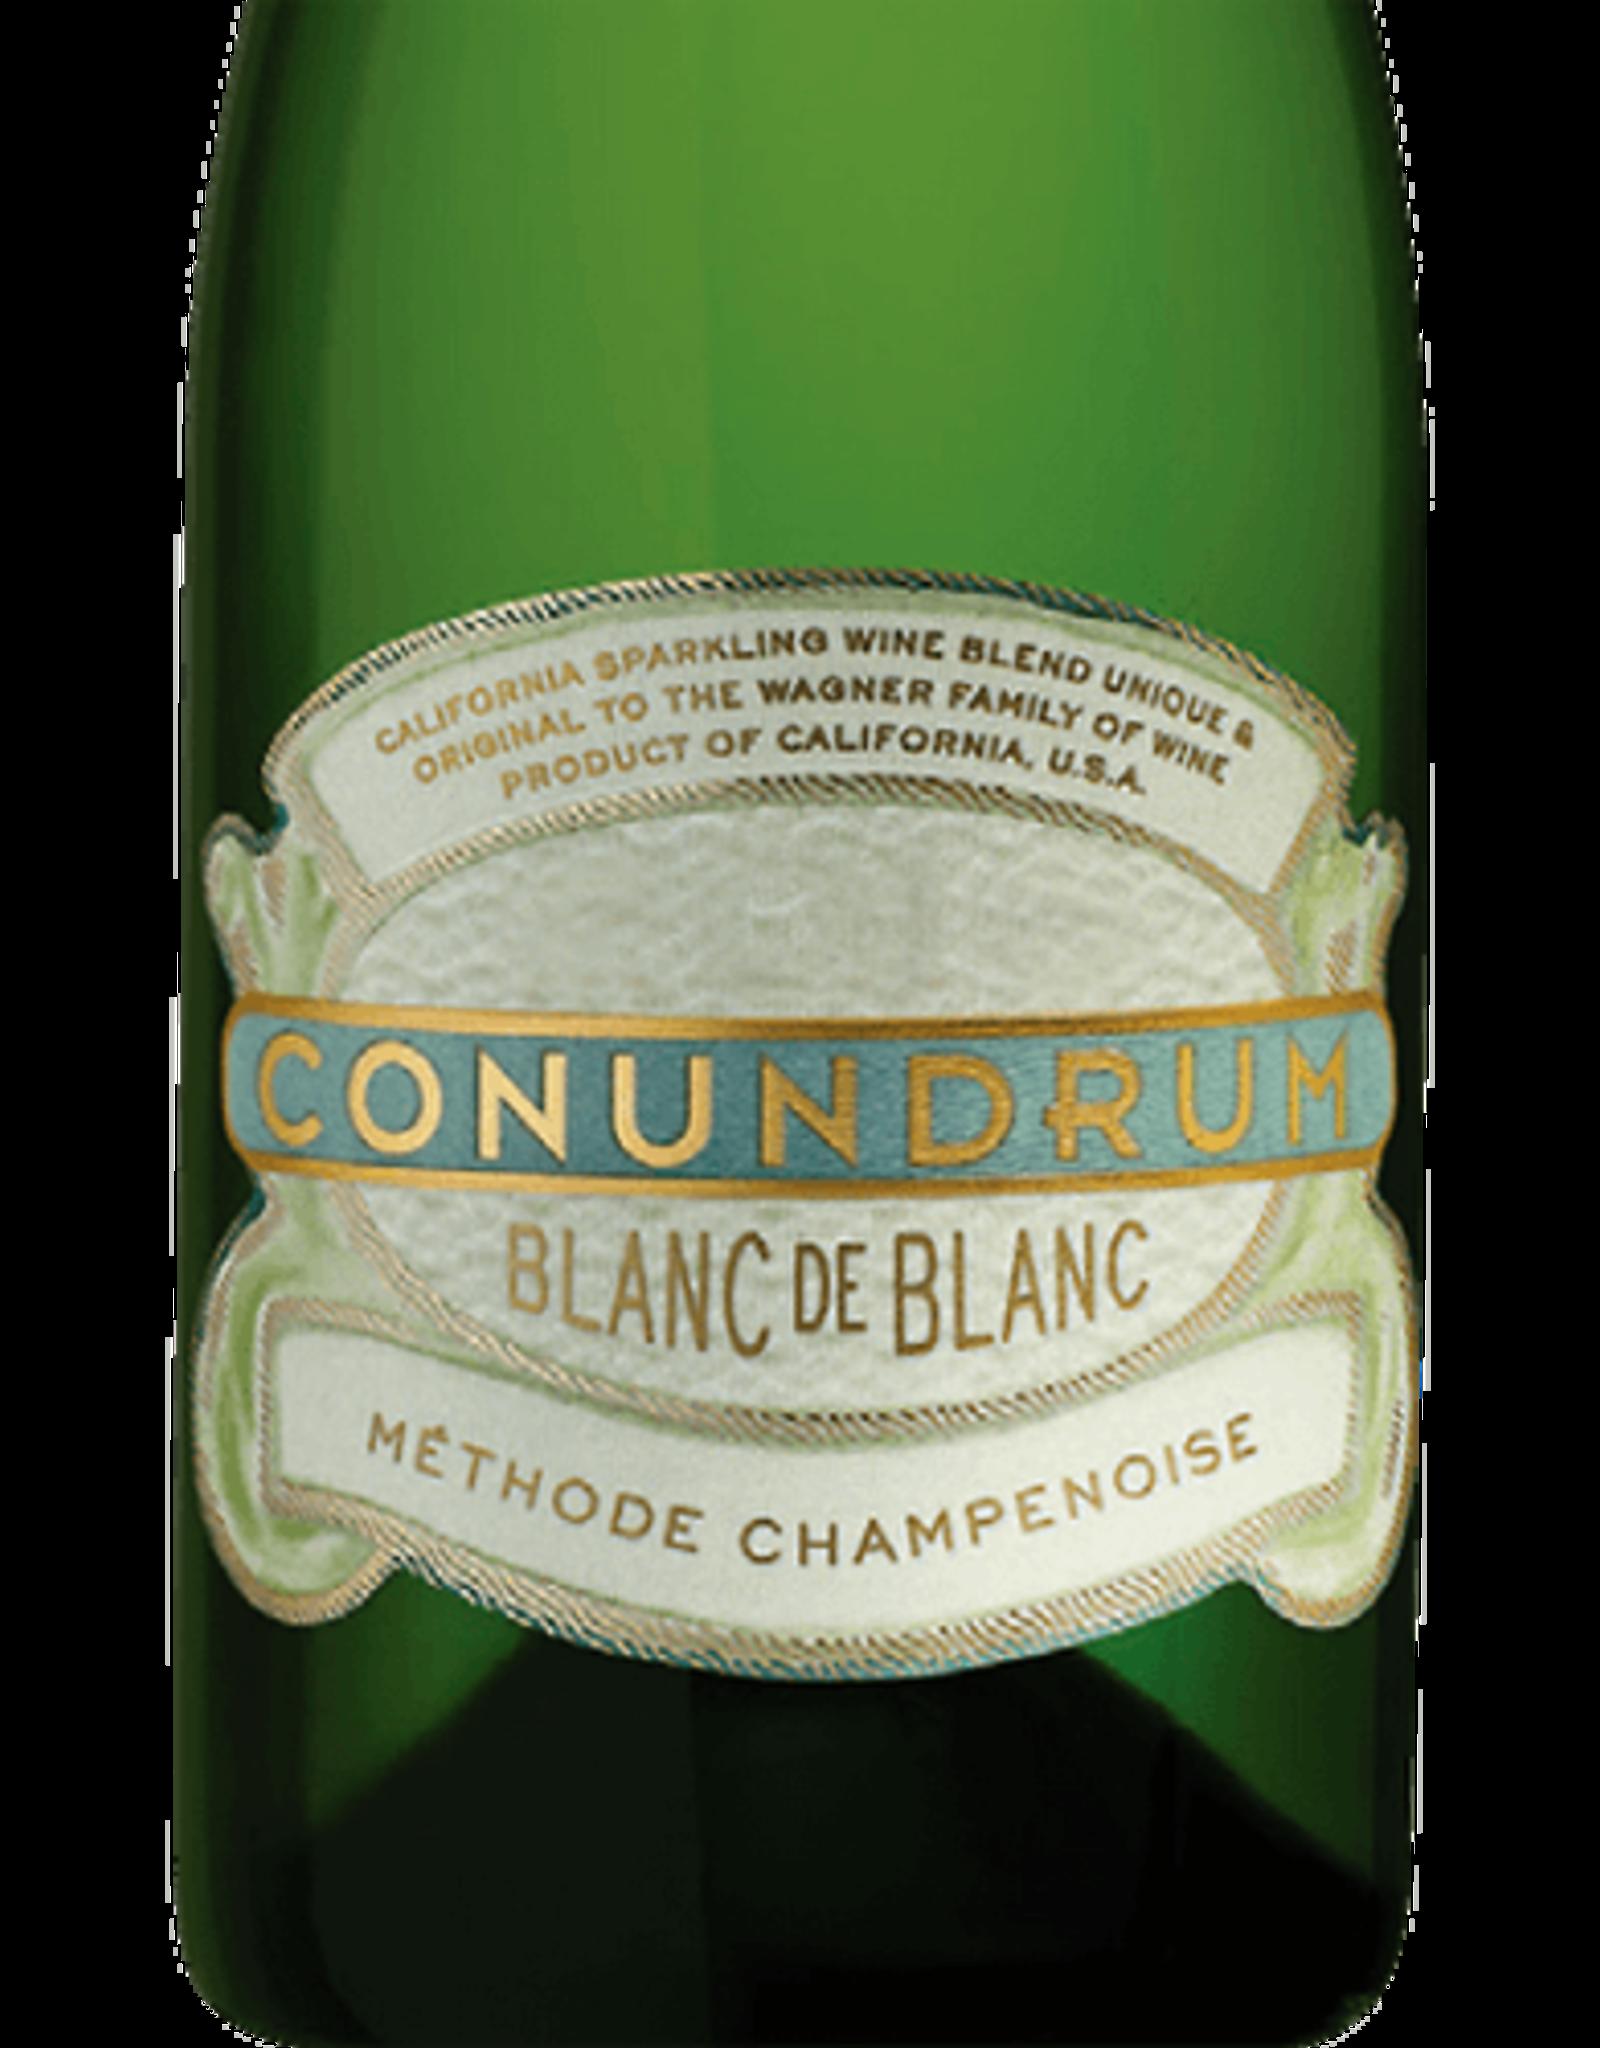 CONUNDRUM BLANC DE BLANC 2017